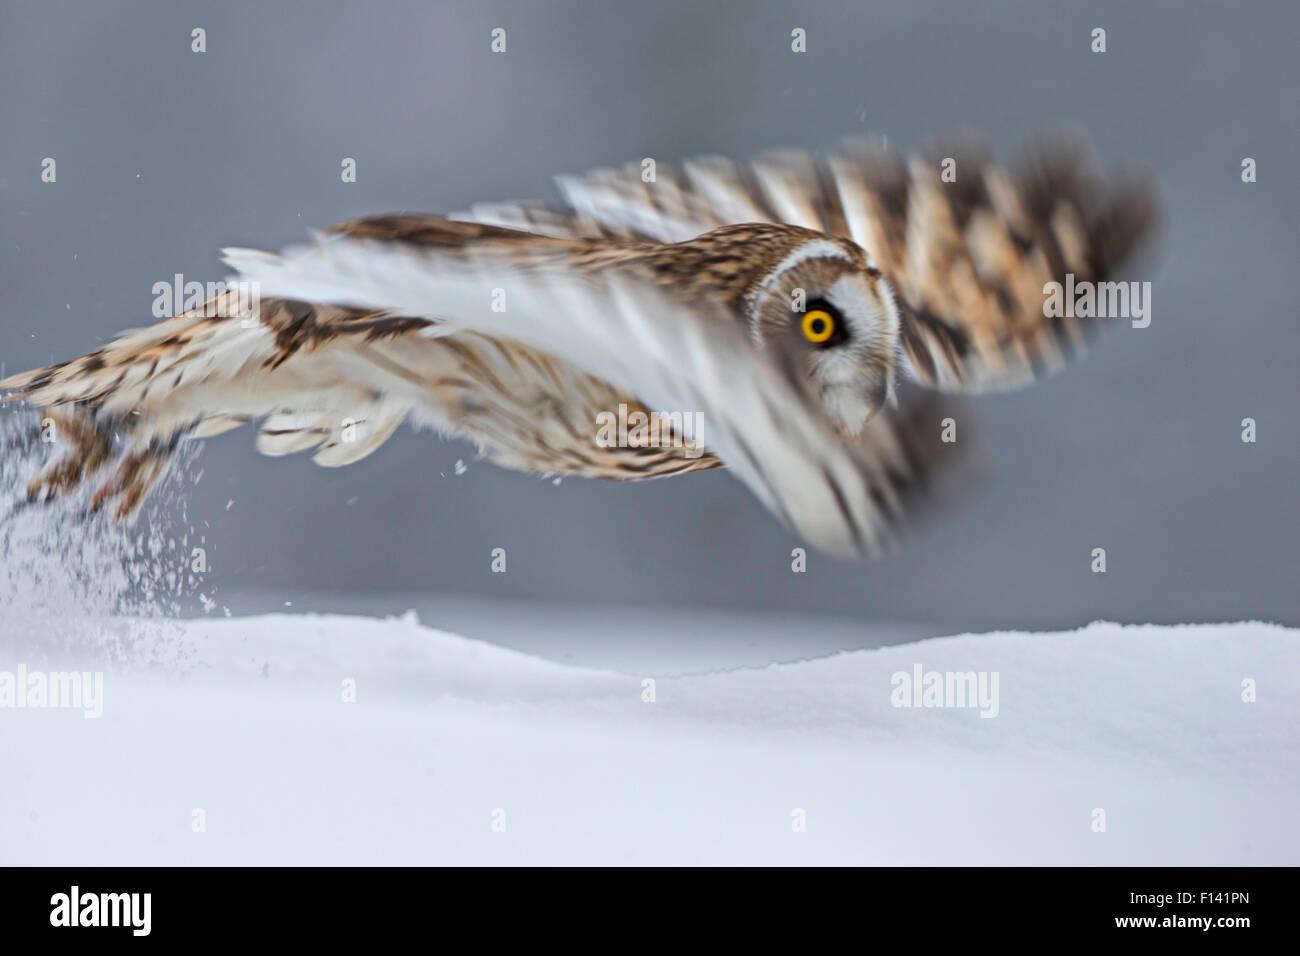 Short Eared Owl (Asio flammeus) taking off, blurred motion photograph, UK, January. Captive Stock Photo